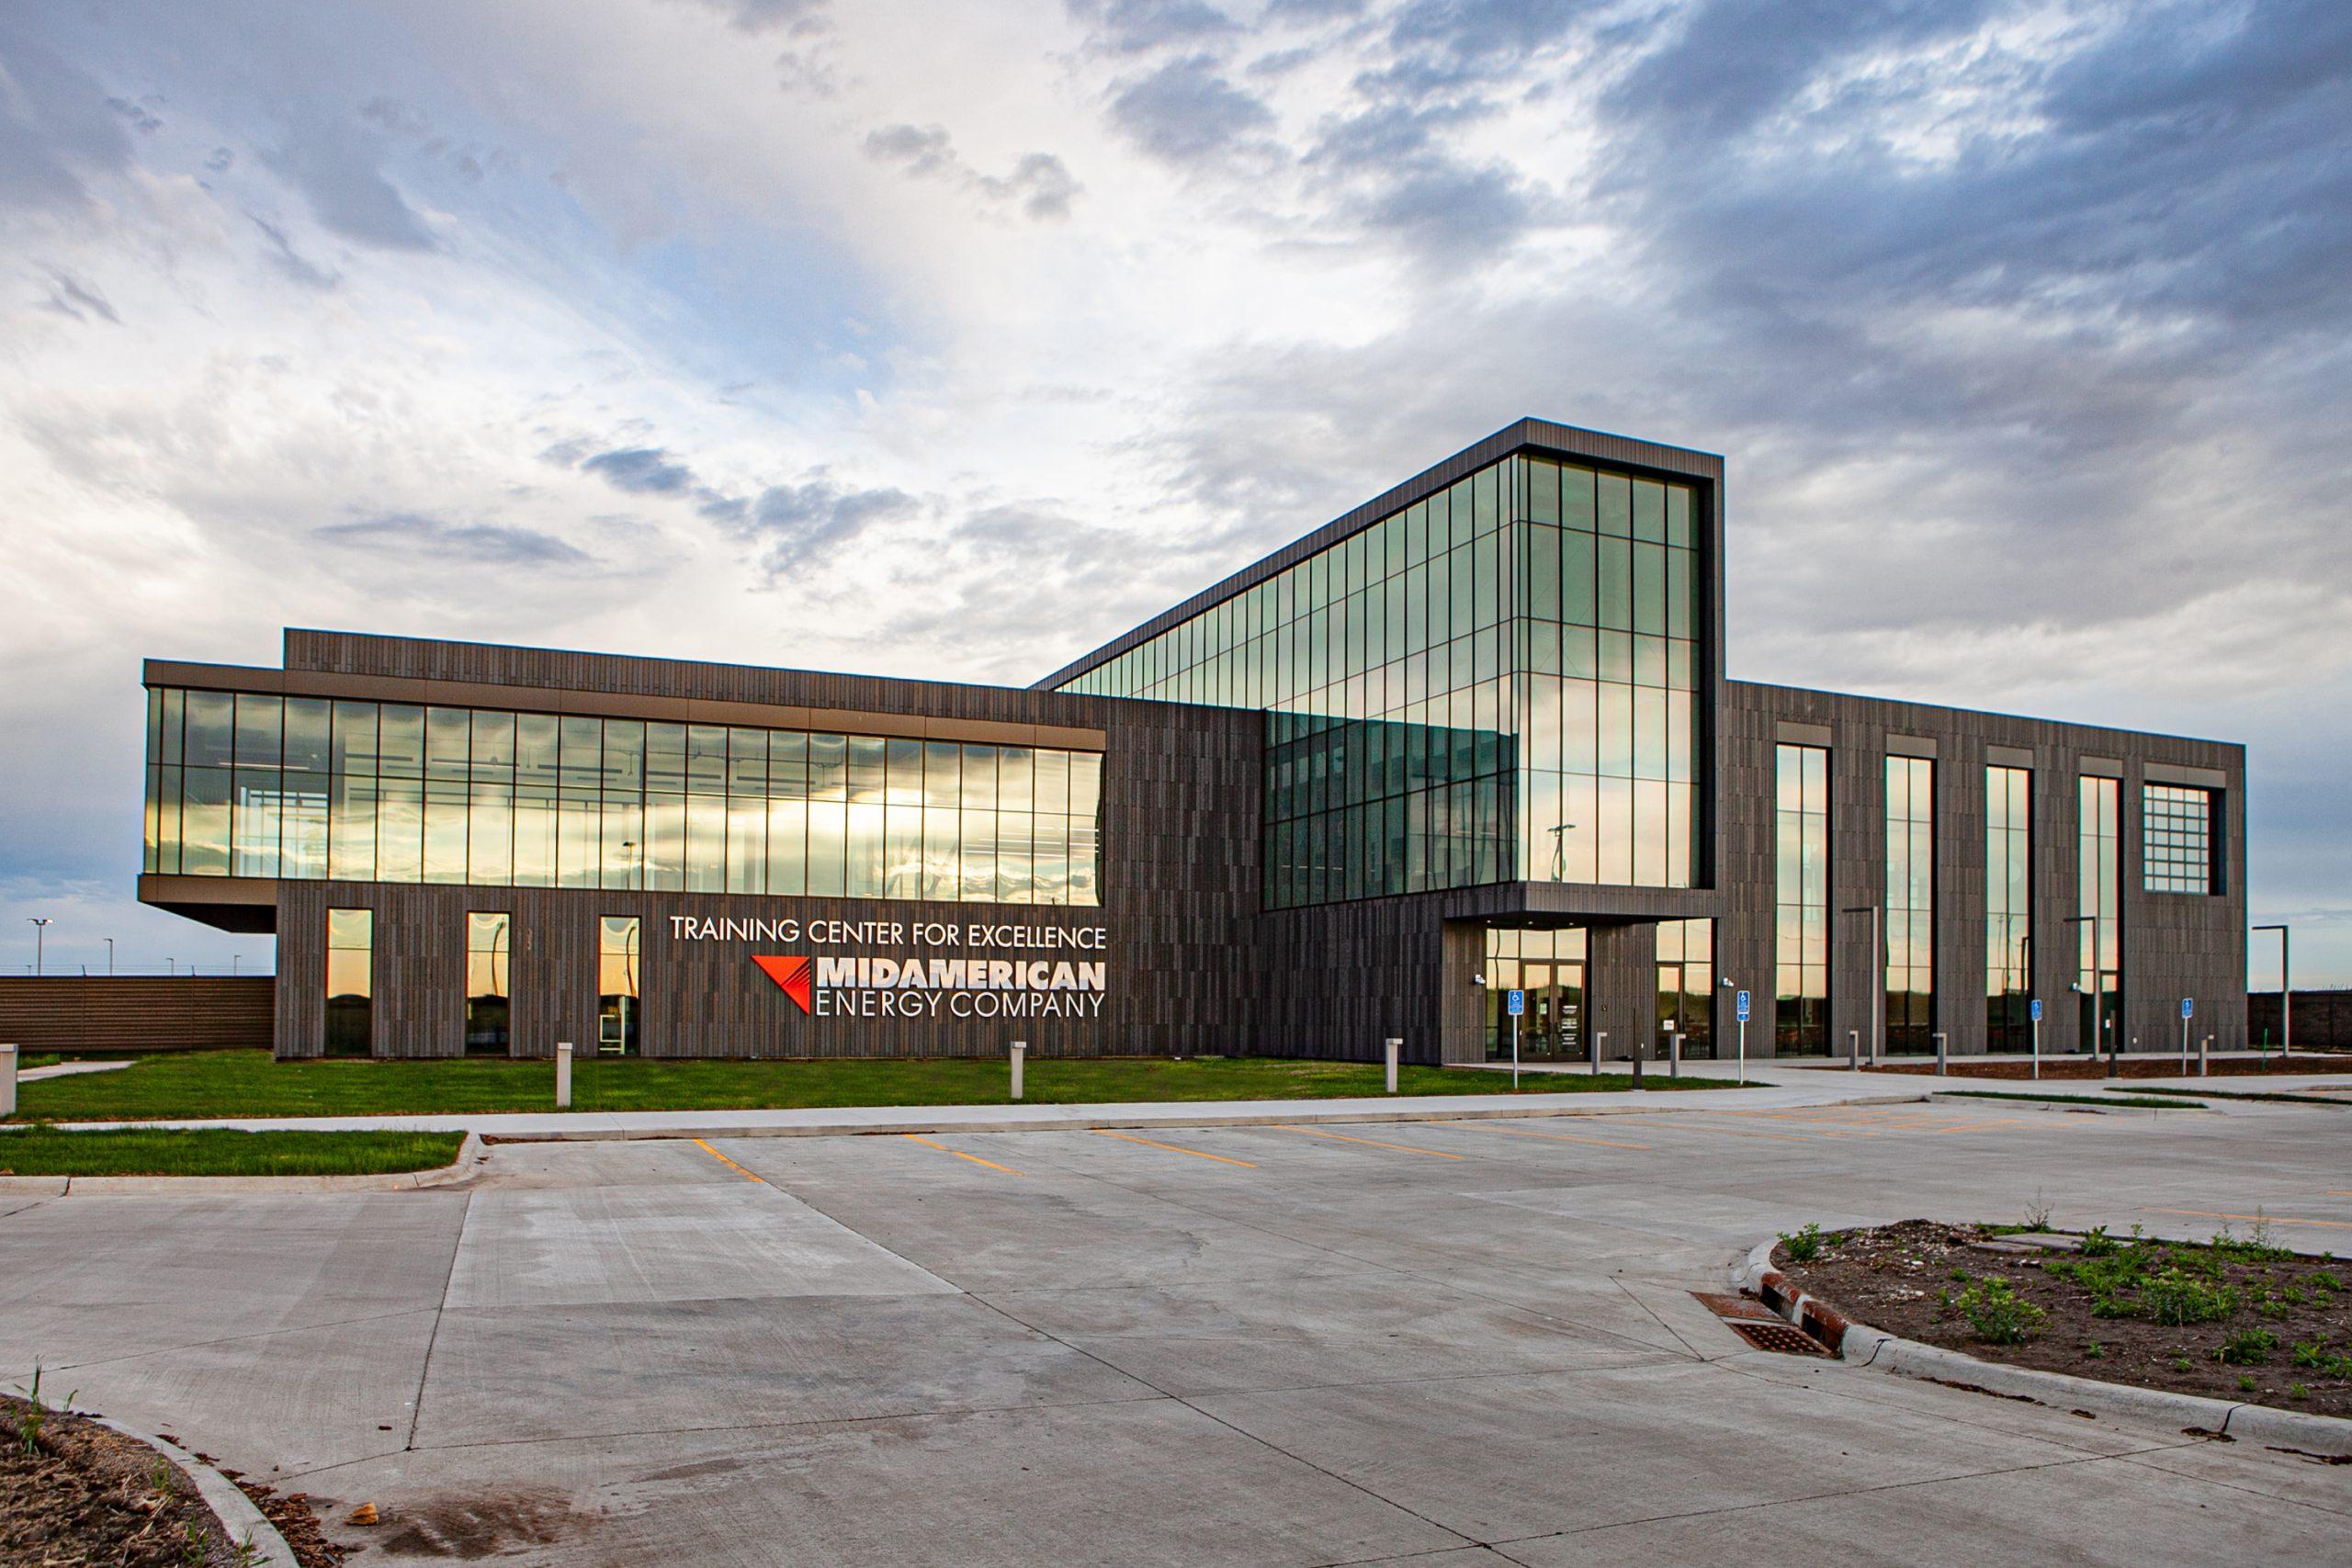 MidAmDCTrainingCenter 2019 Corporate Enviroments 01